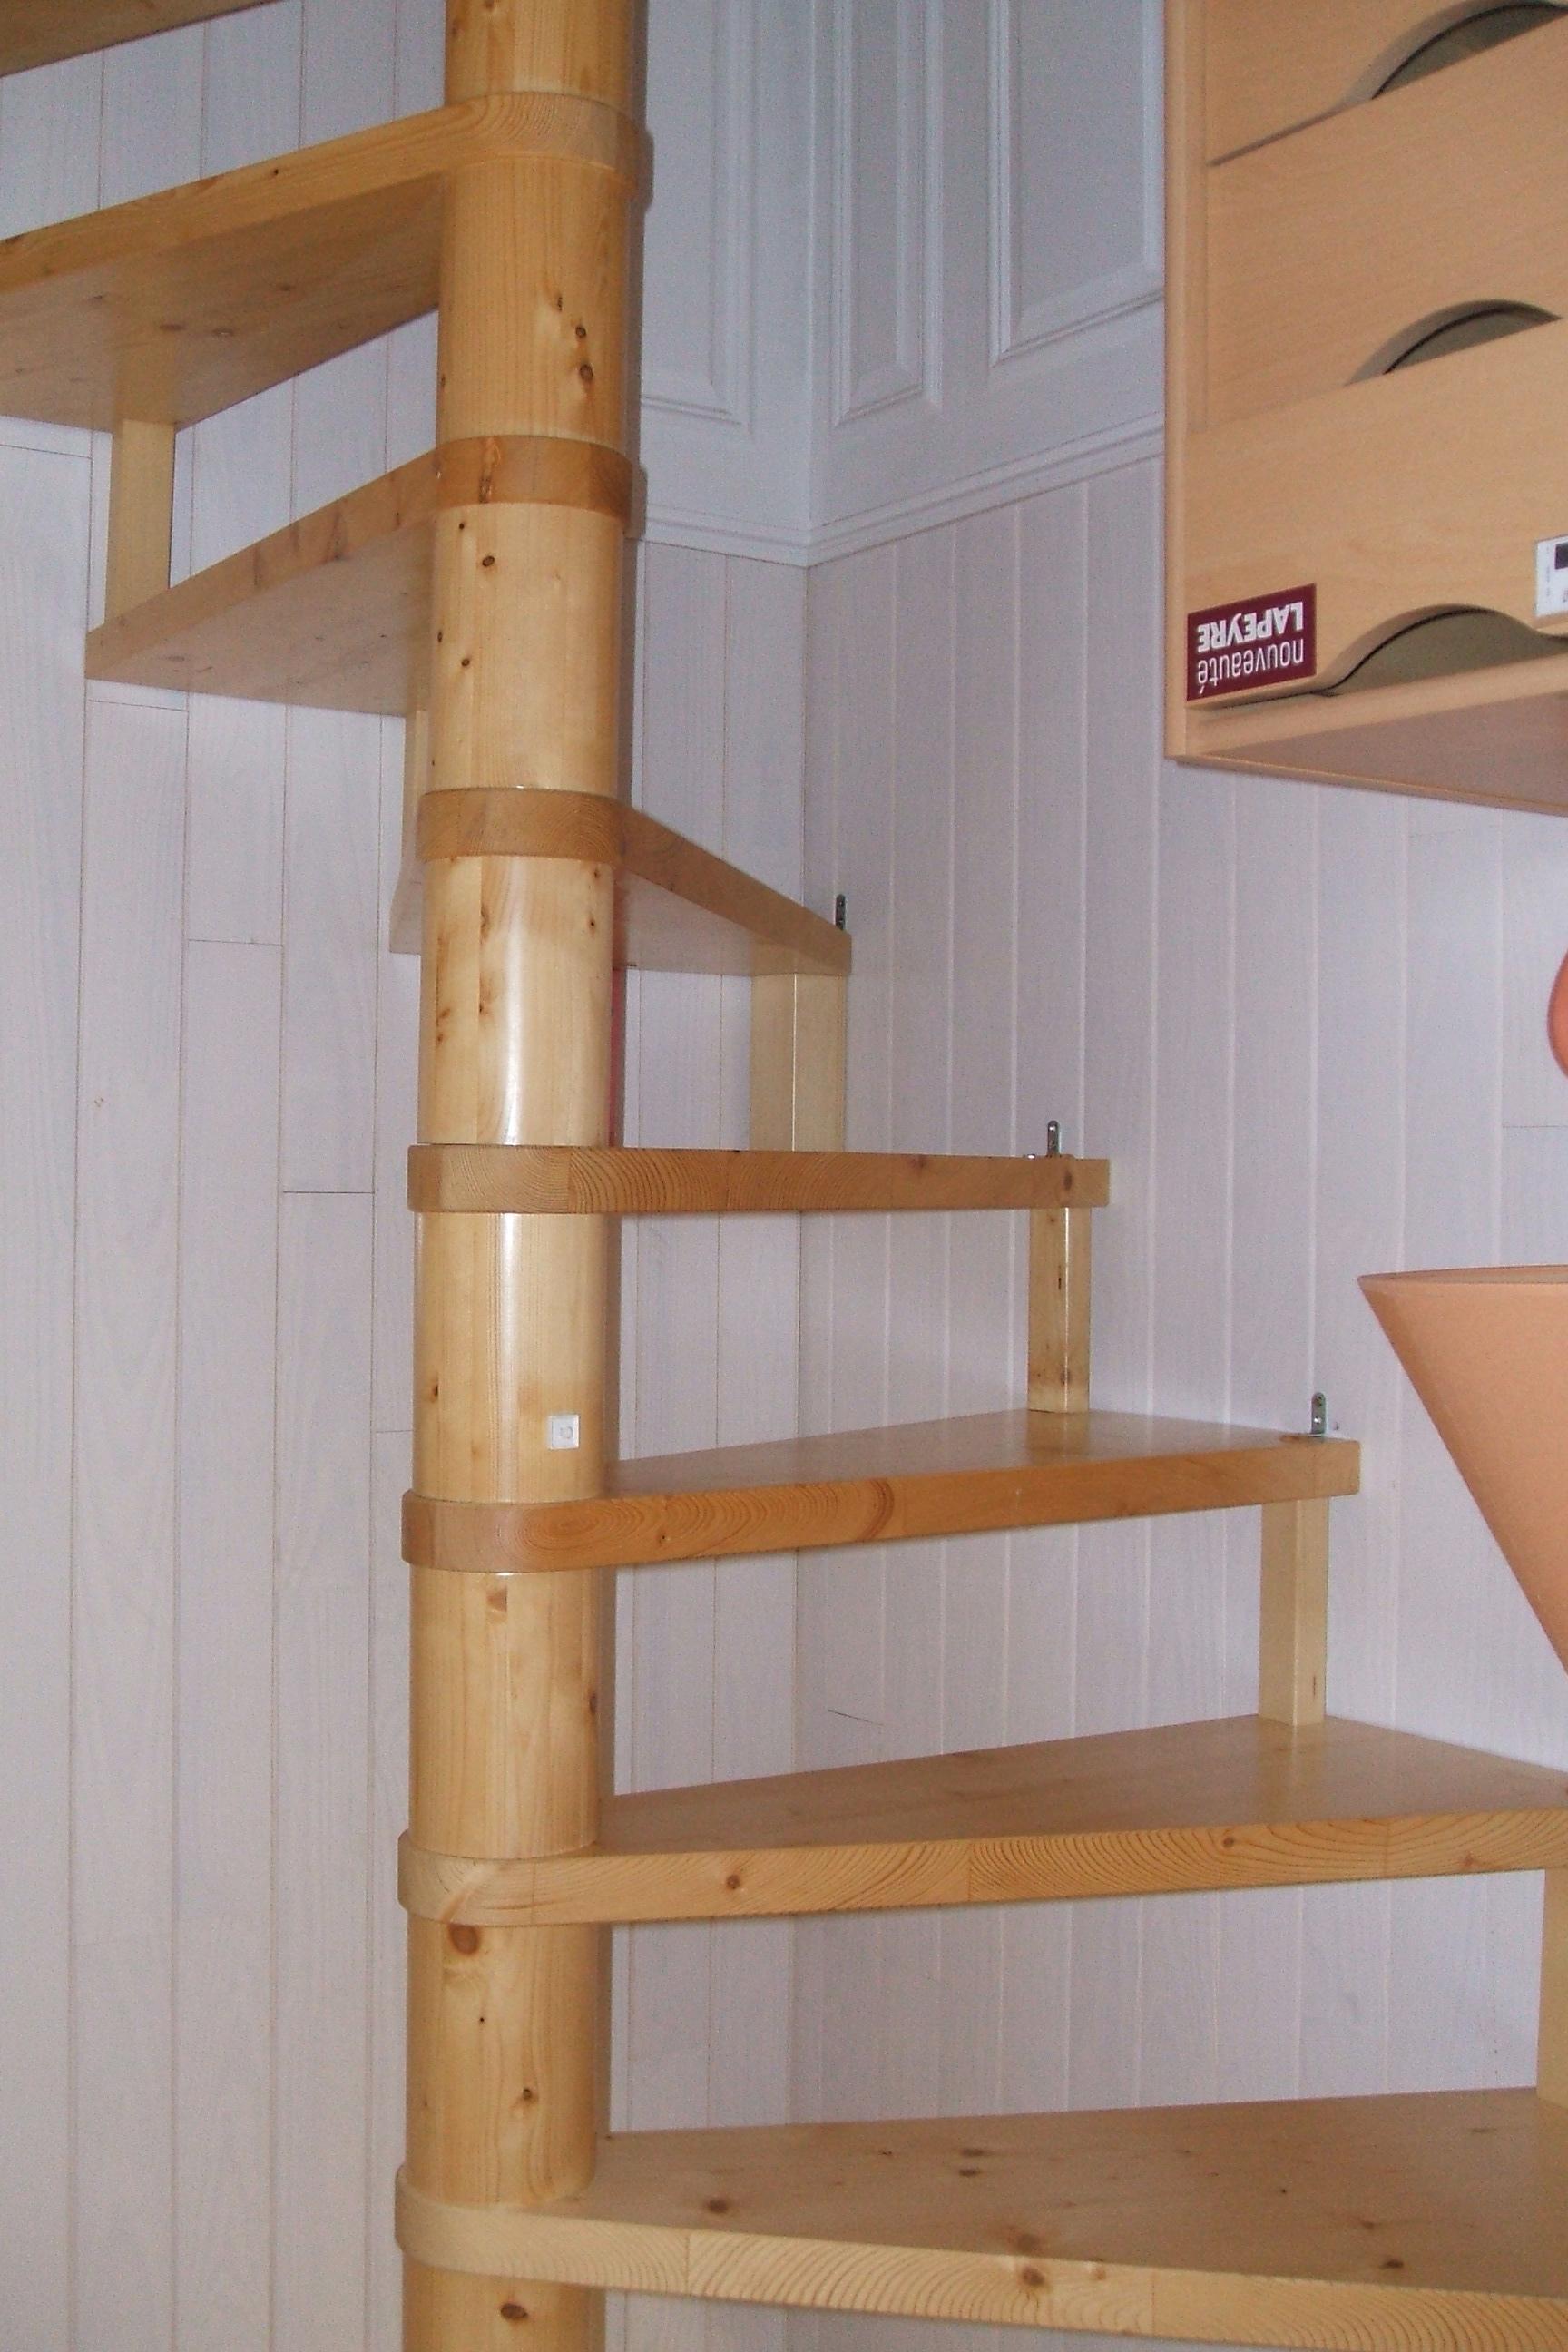 les escaliers. Black Bedroom Furniture Sets. Home Design Ideas